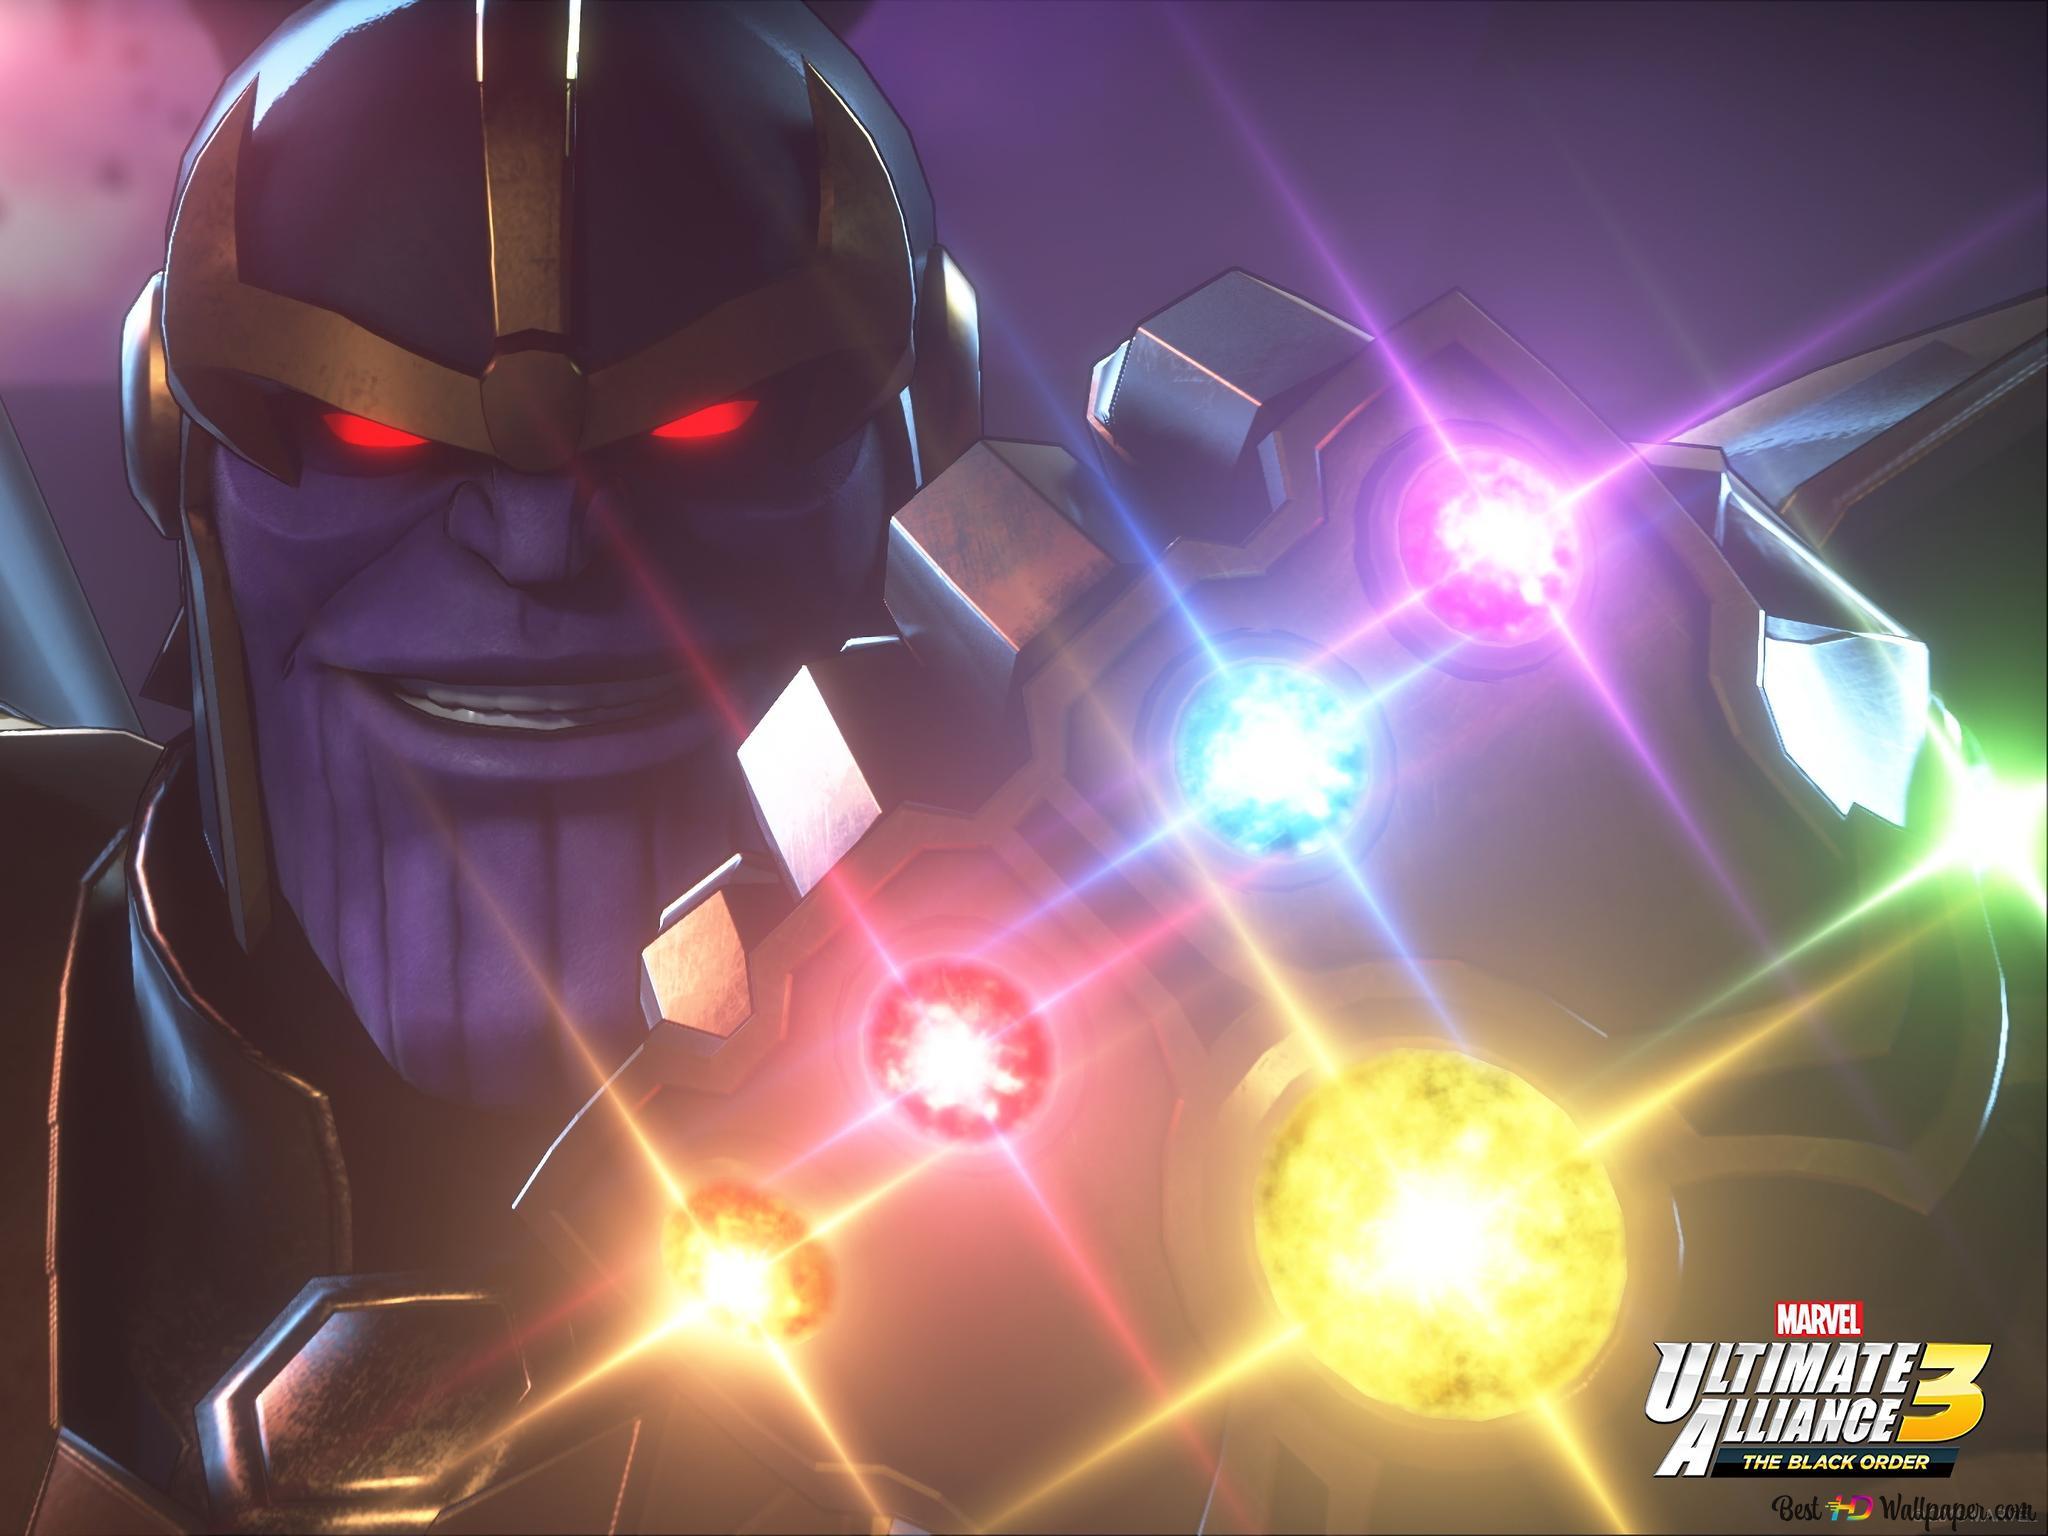 Marvel Ultimate Alliance 3 Hd Wallpaper Download